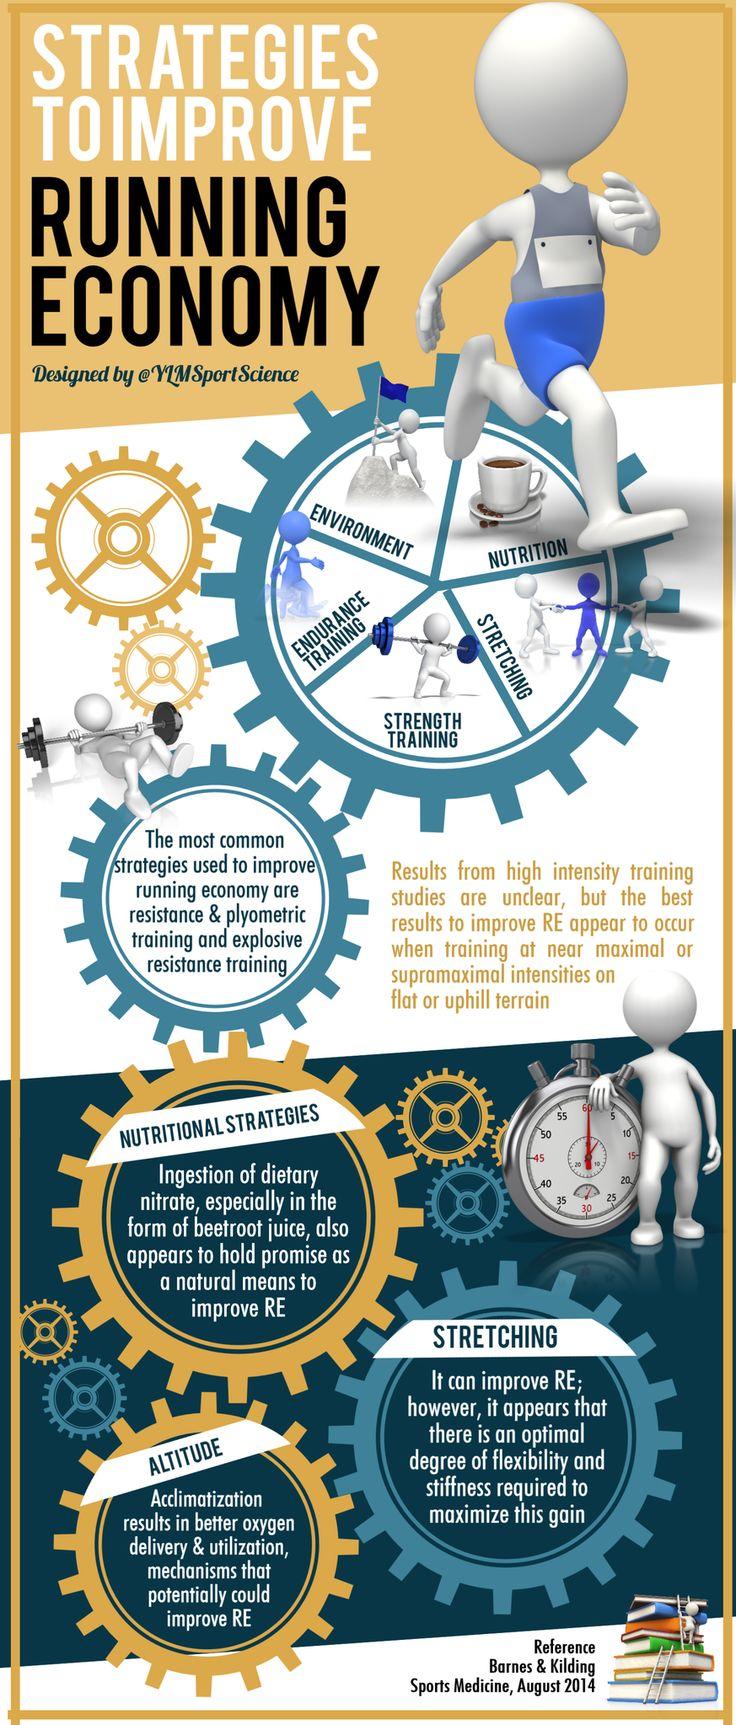 To improve running economy: Strength Training Stretching Altitude Beetroot juice! http://ylmsportscience.blogspot.com/2014/09/training-performance-strategies-to.html …